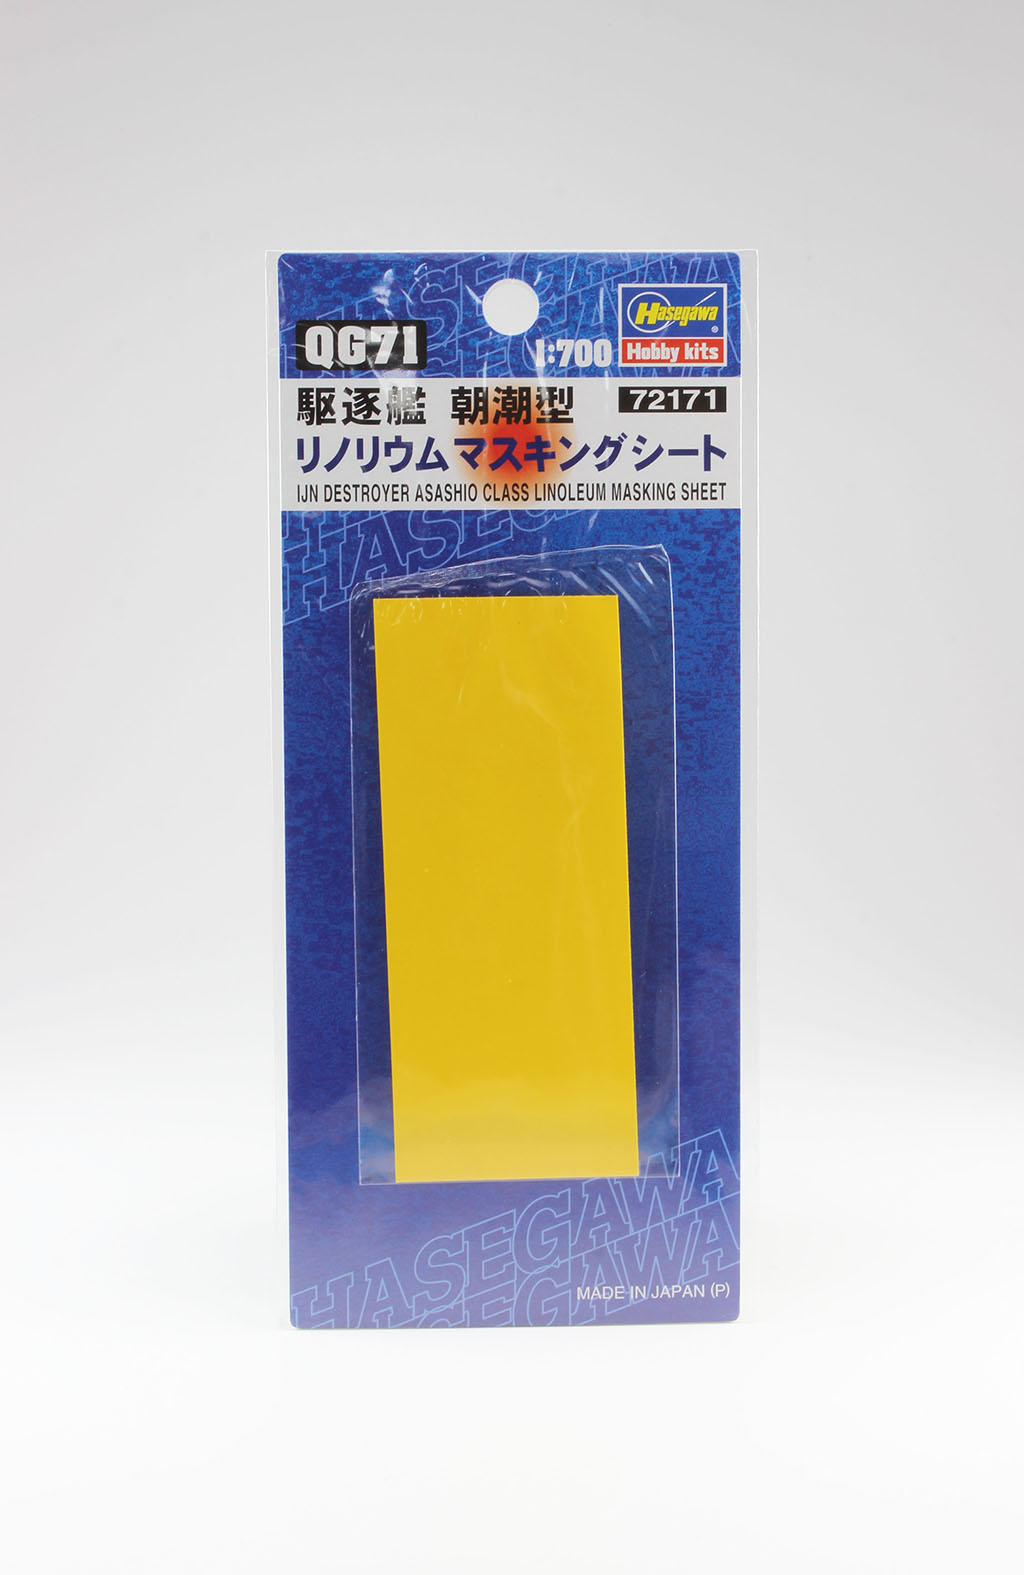 Hasegawa Ijn Destroyer Asashio Class Linoleum Masking Sheet QG71